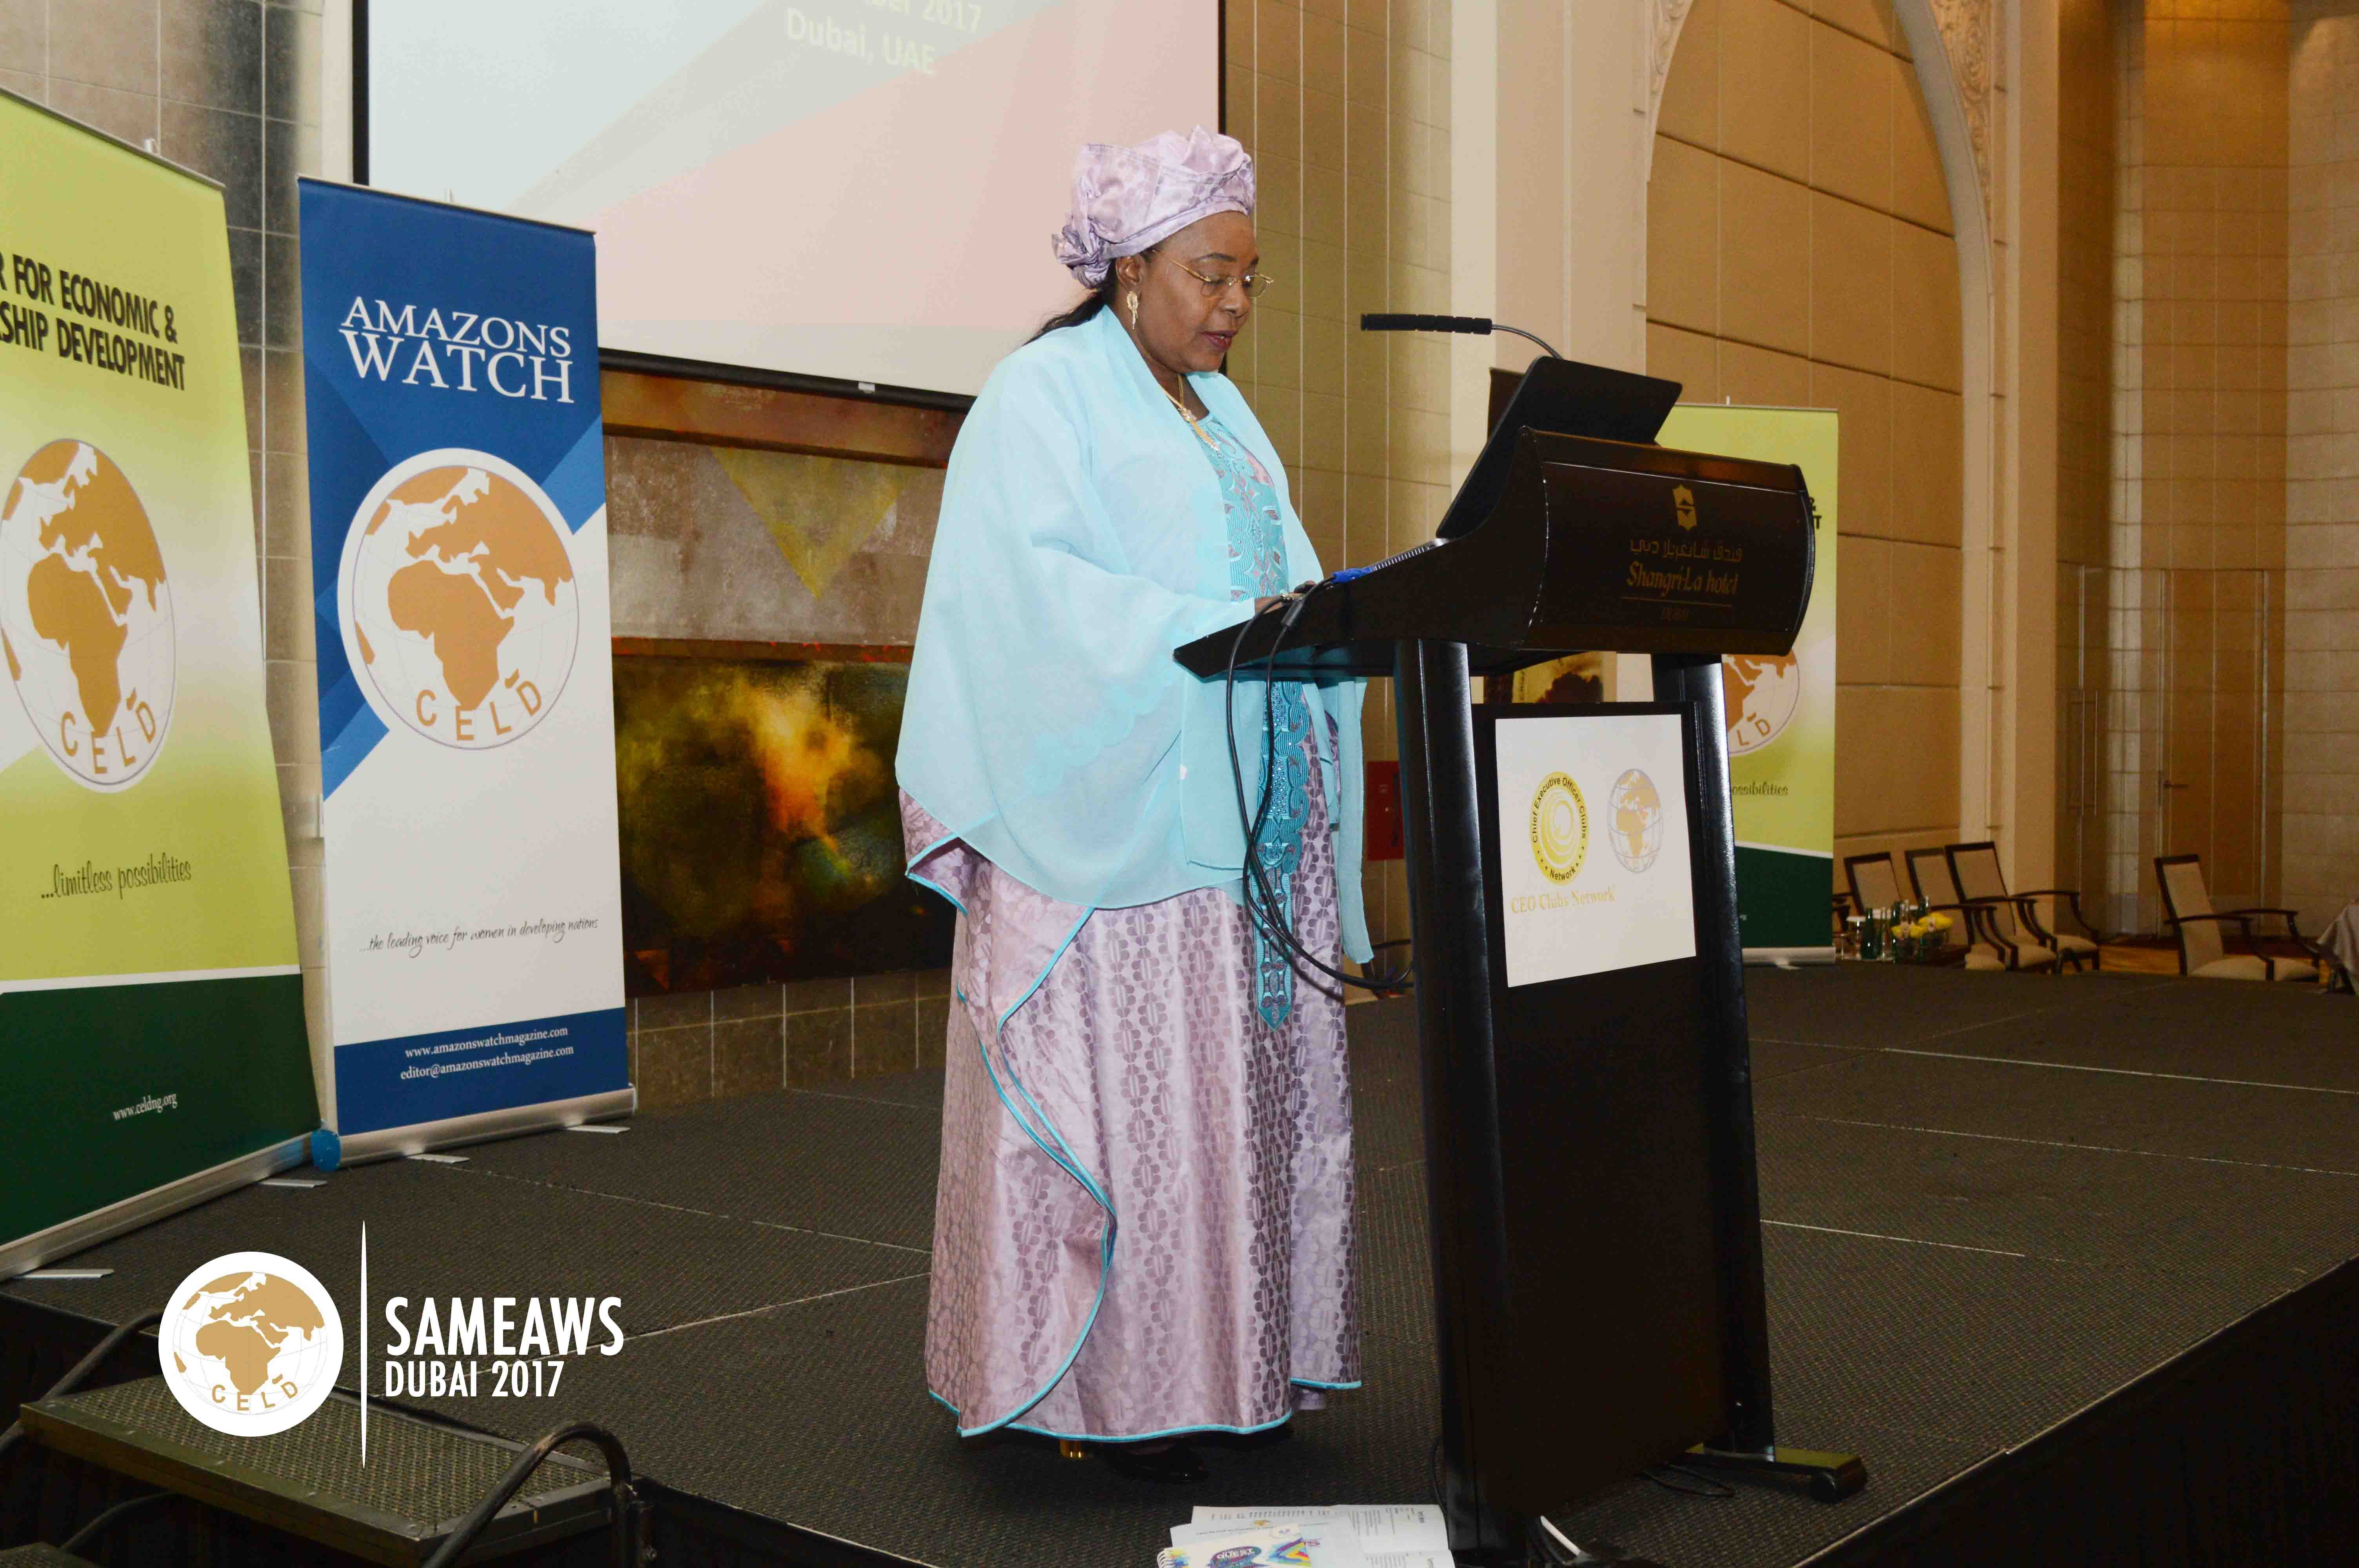 H.E. Aissata Mohammadu Issoufou (First Lady, Republic of Niger) making a special presentaion during SAMEAWS 2017